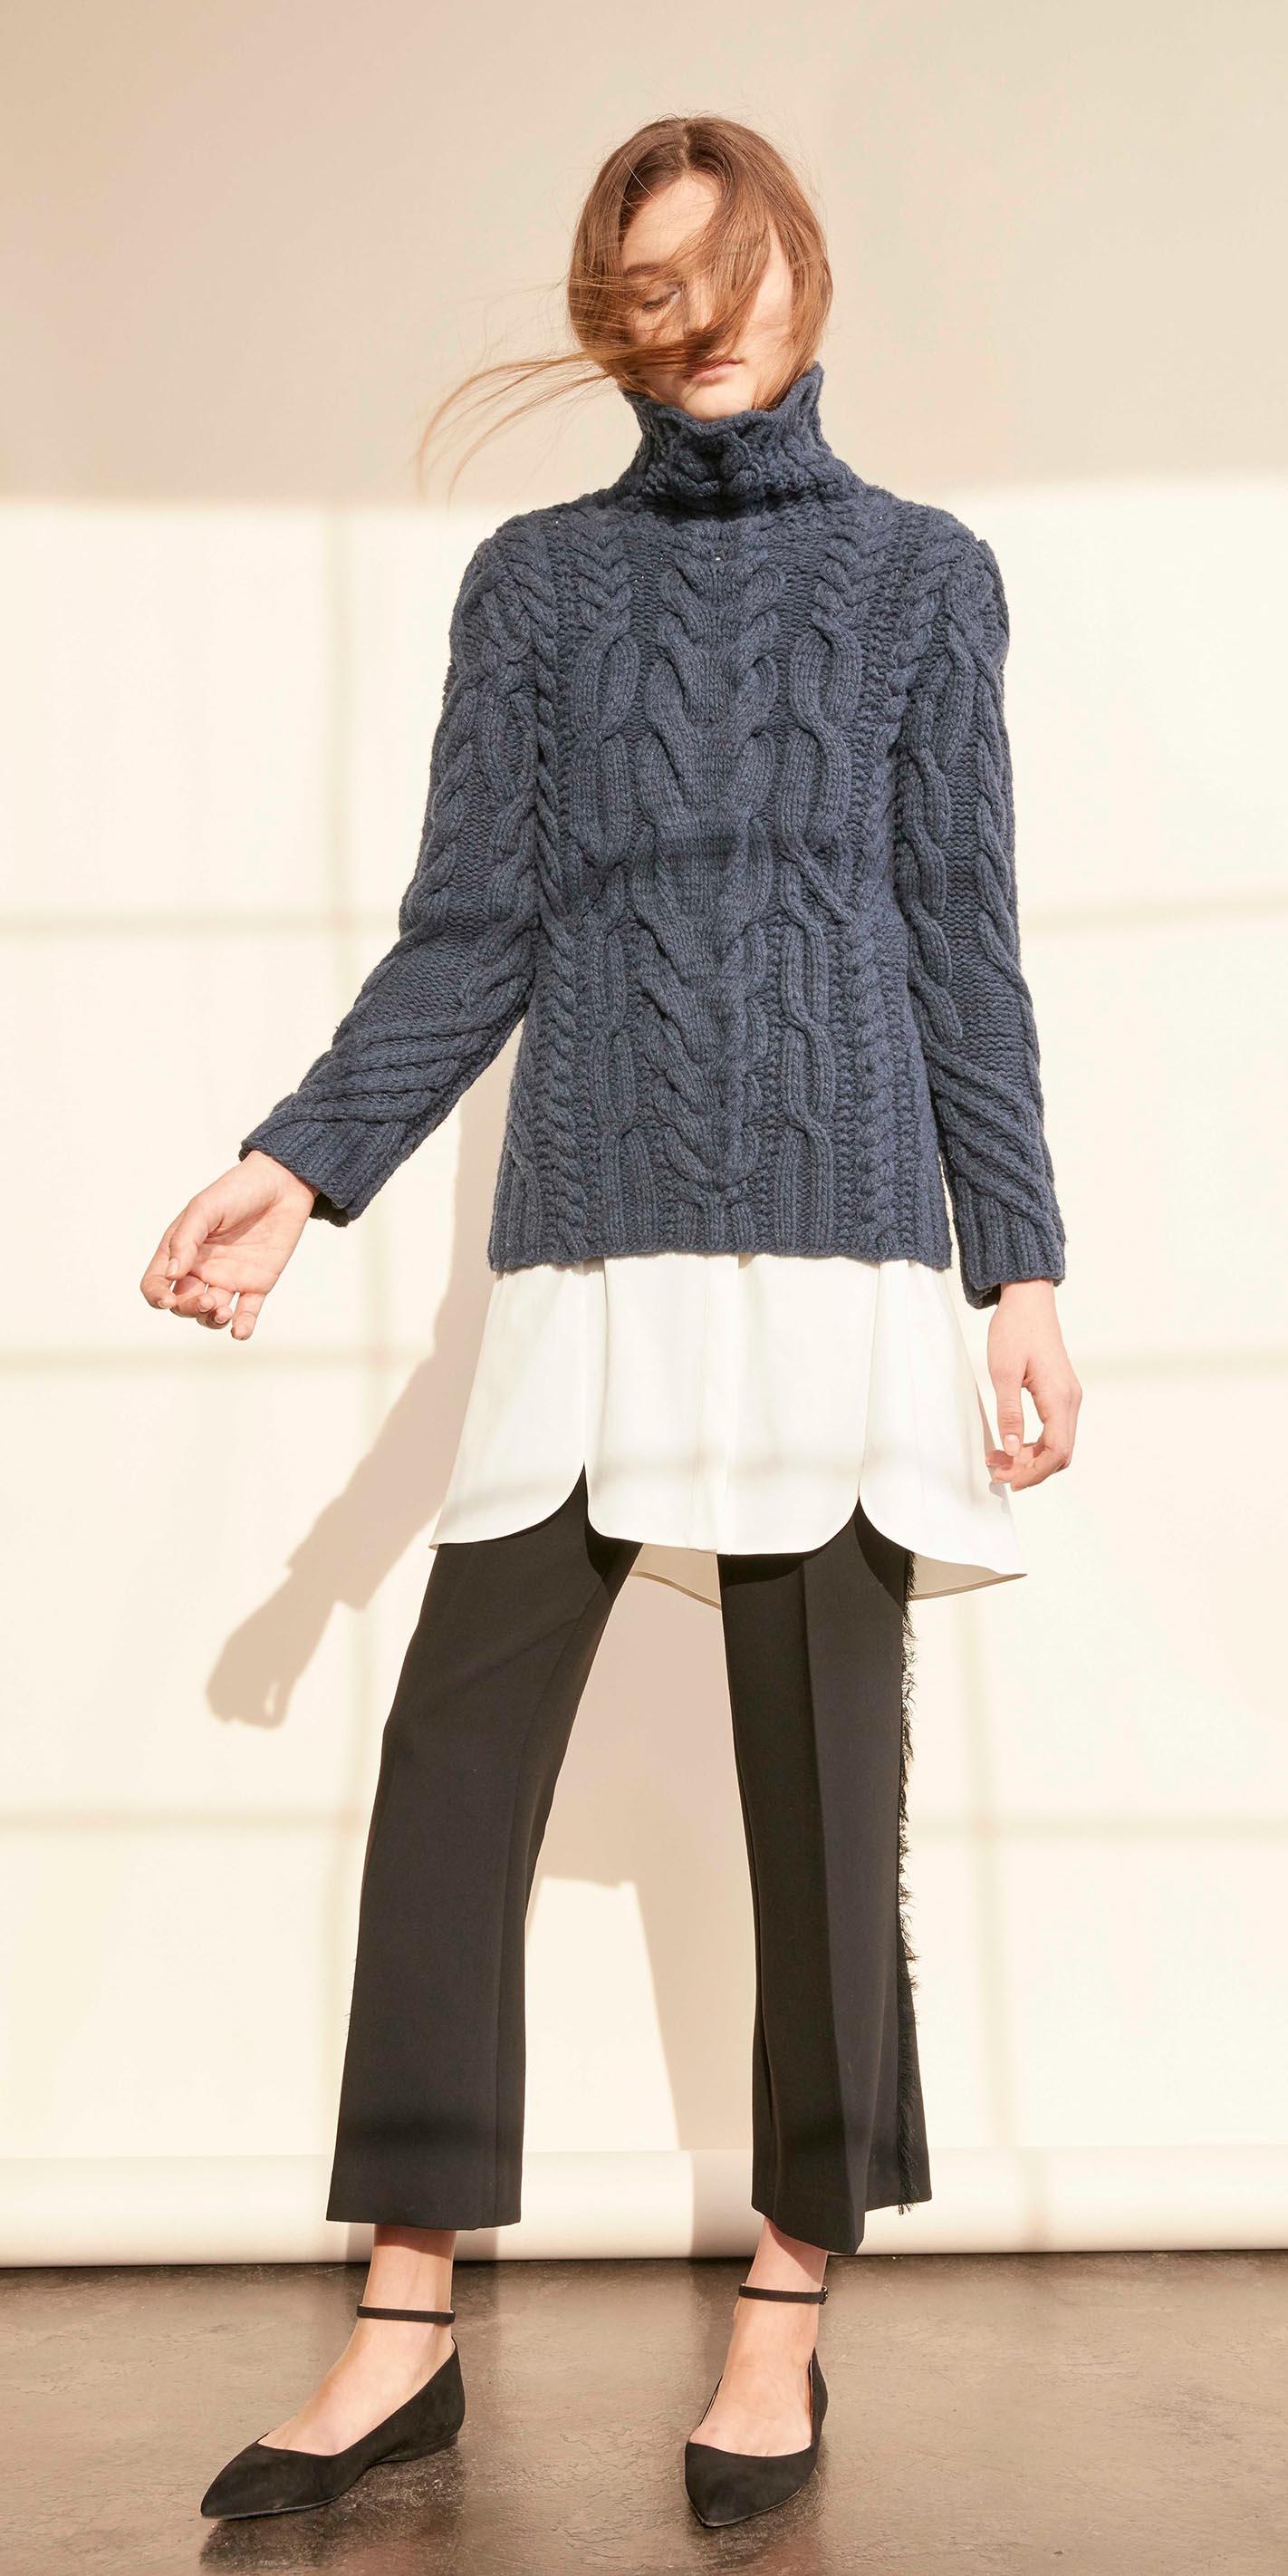 black-slim-pants-black-shoe-flats-blue-navy-sweater-turtleneck-layer-howtowear-fall-winter-hairr-work.jpg